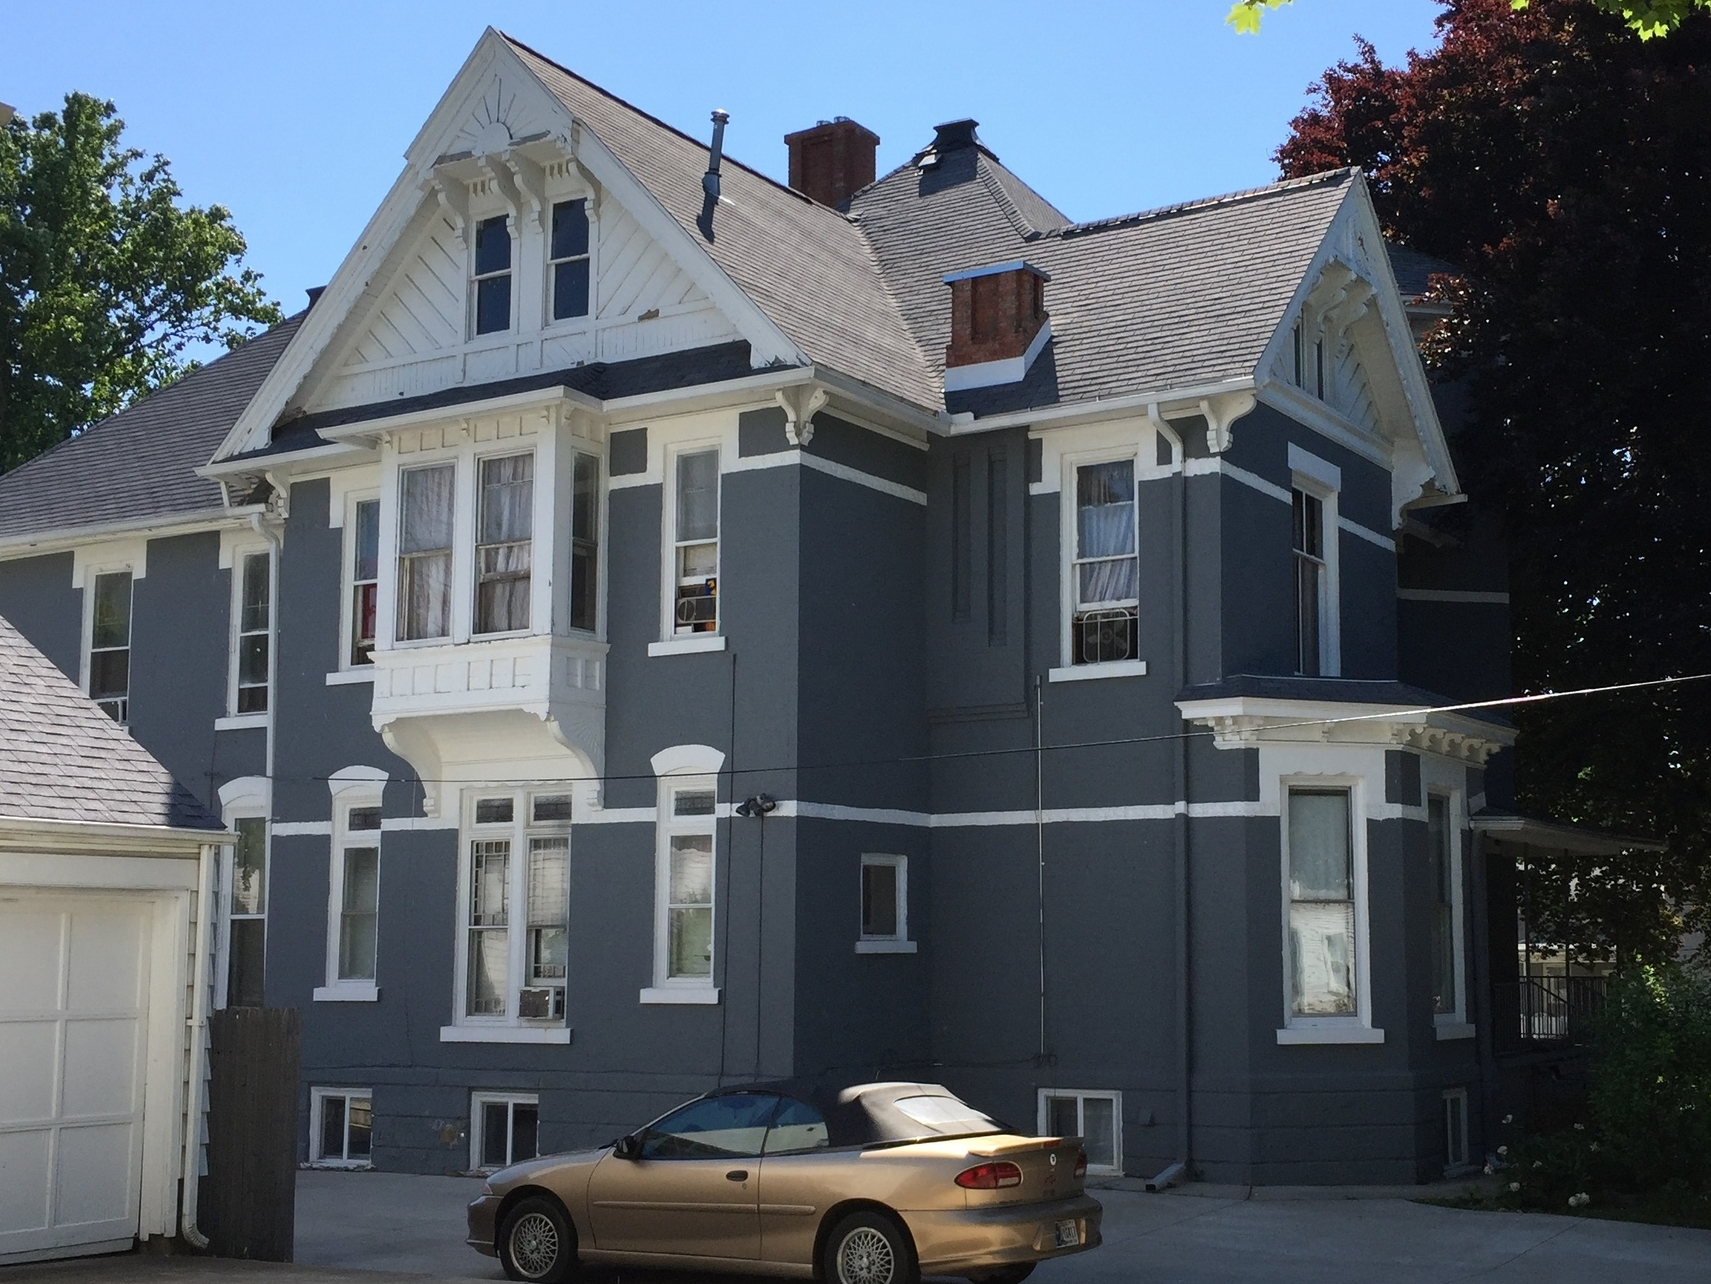 Robert Gilliland House, 304 North Clinton Street, c. 1890